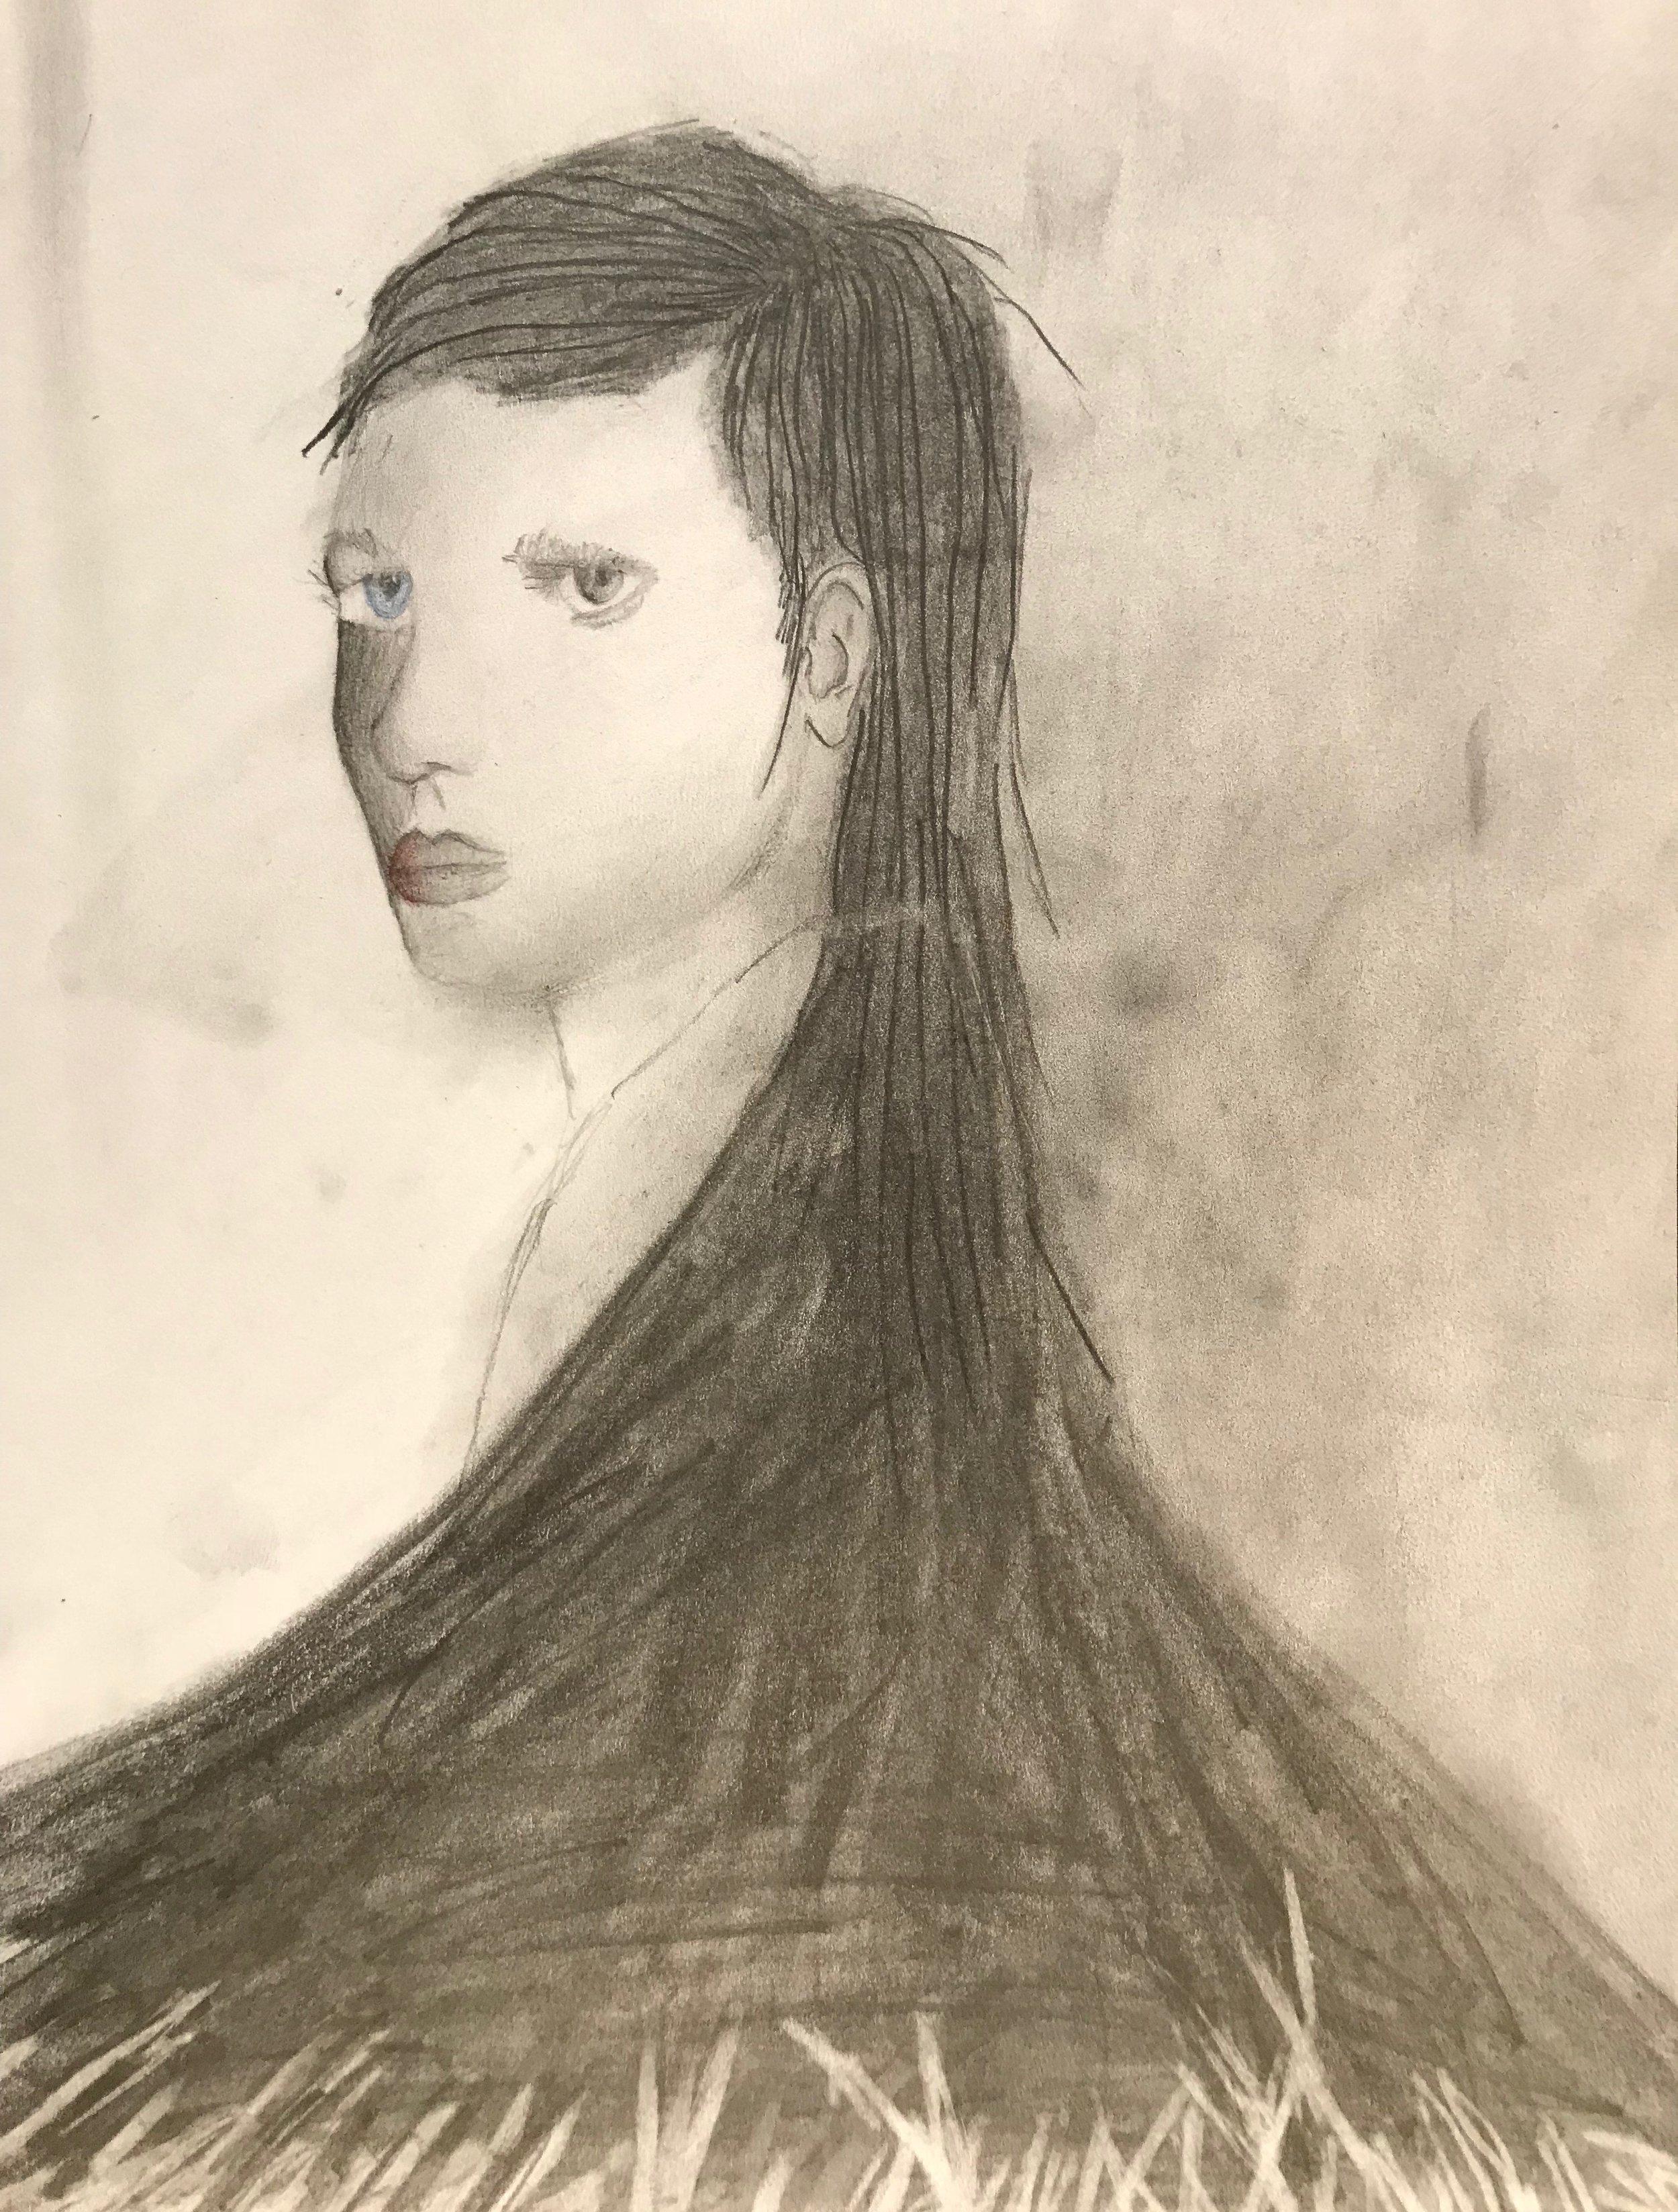 Joon, age 11